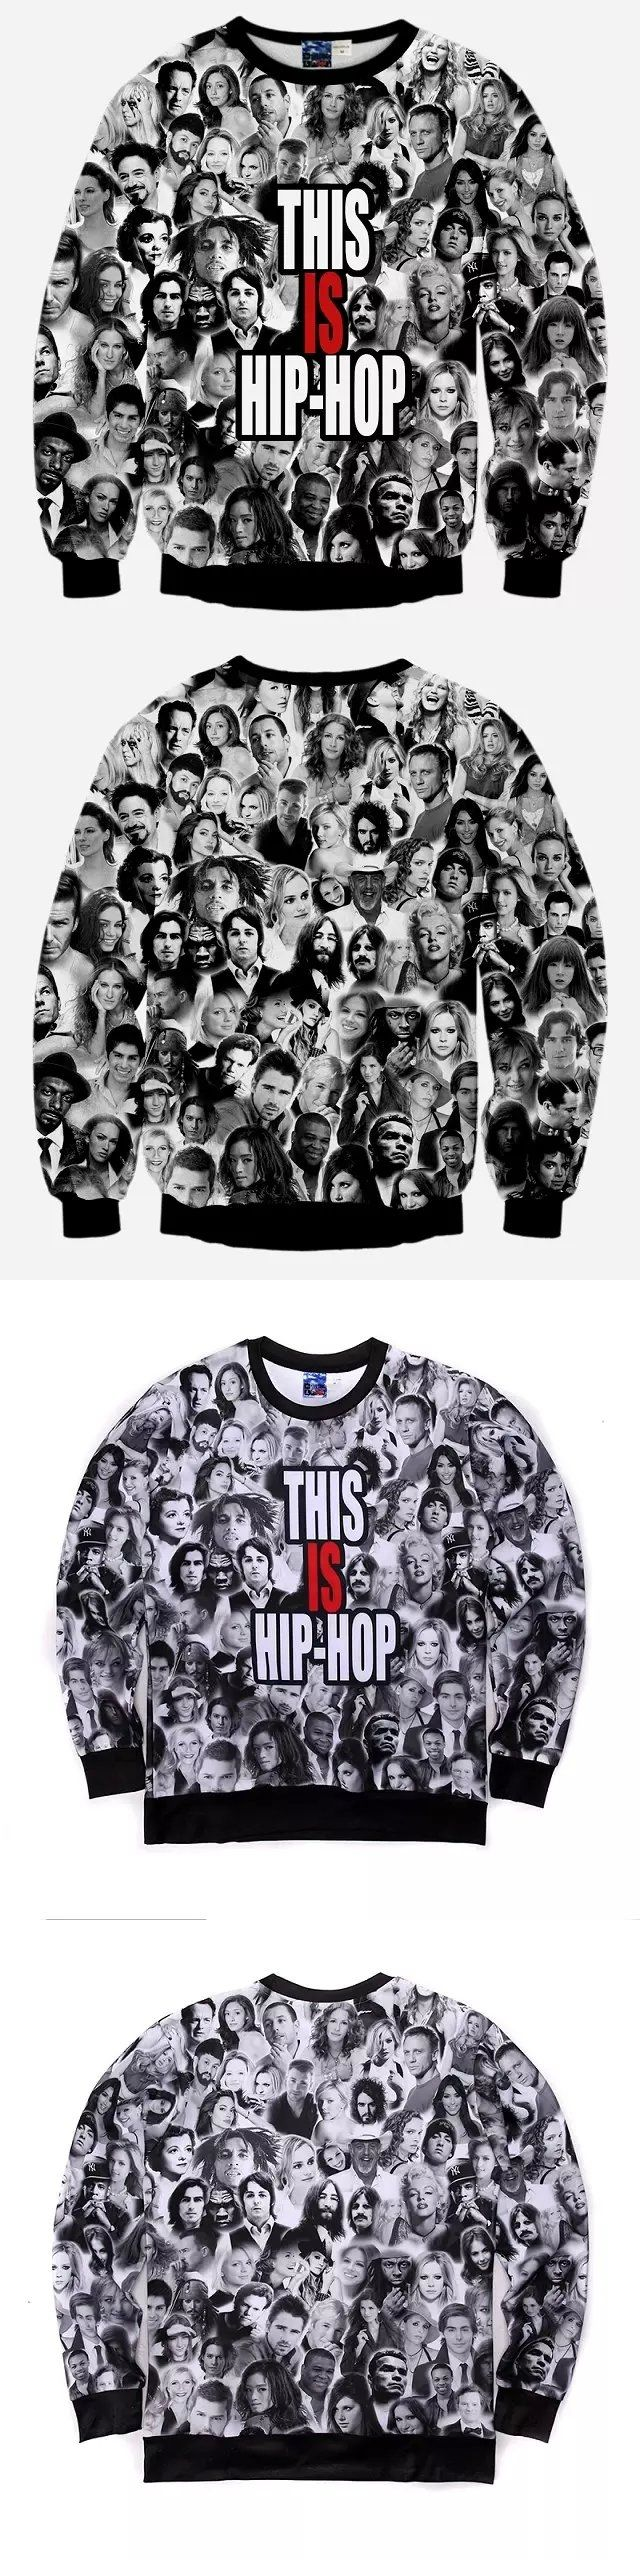 2015 new women/men 3d hip hop hoodies eminem/tupac print sweatshirt moleton masculino tracksuit sudaderas hombre sportwear mujer